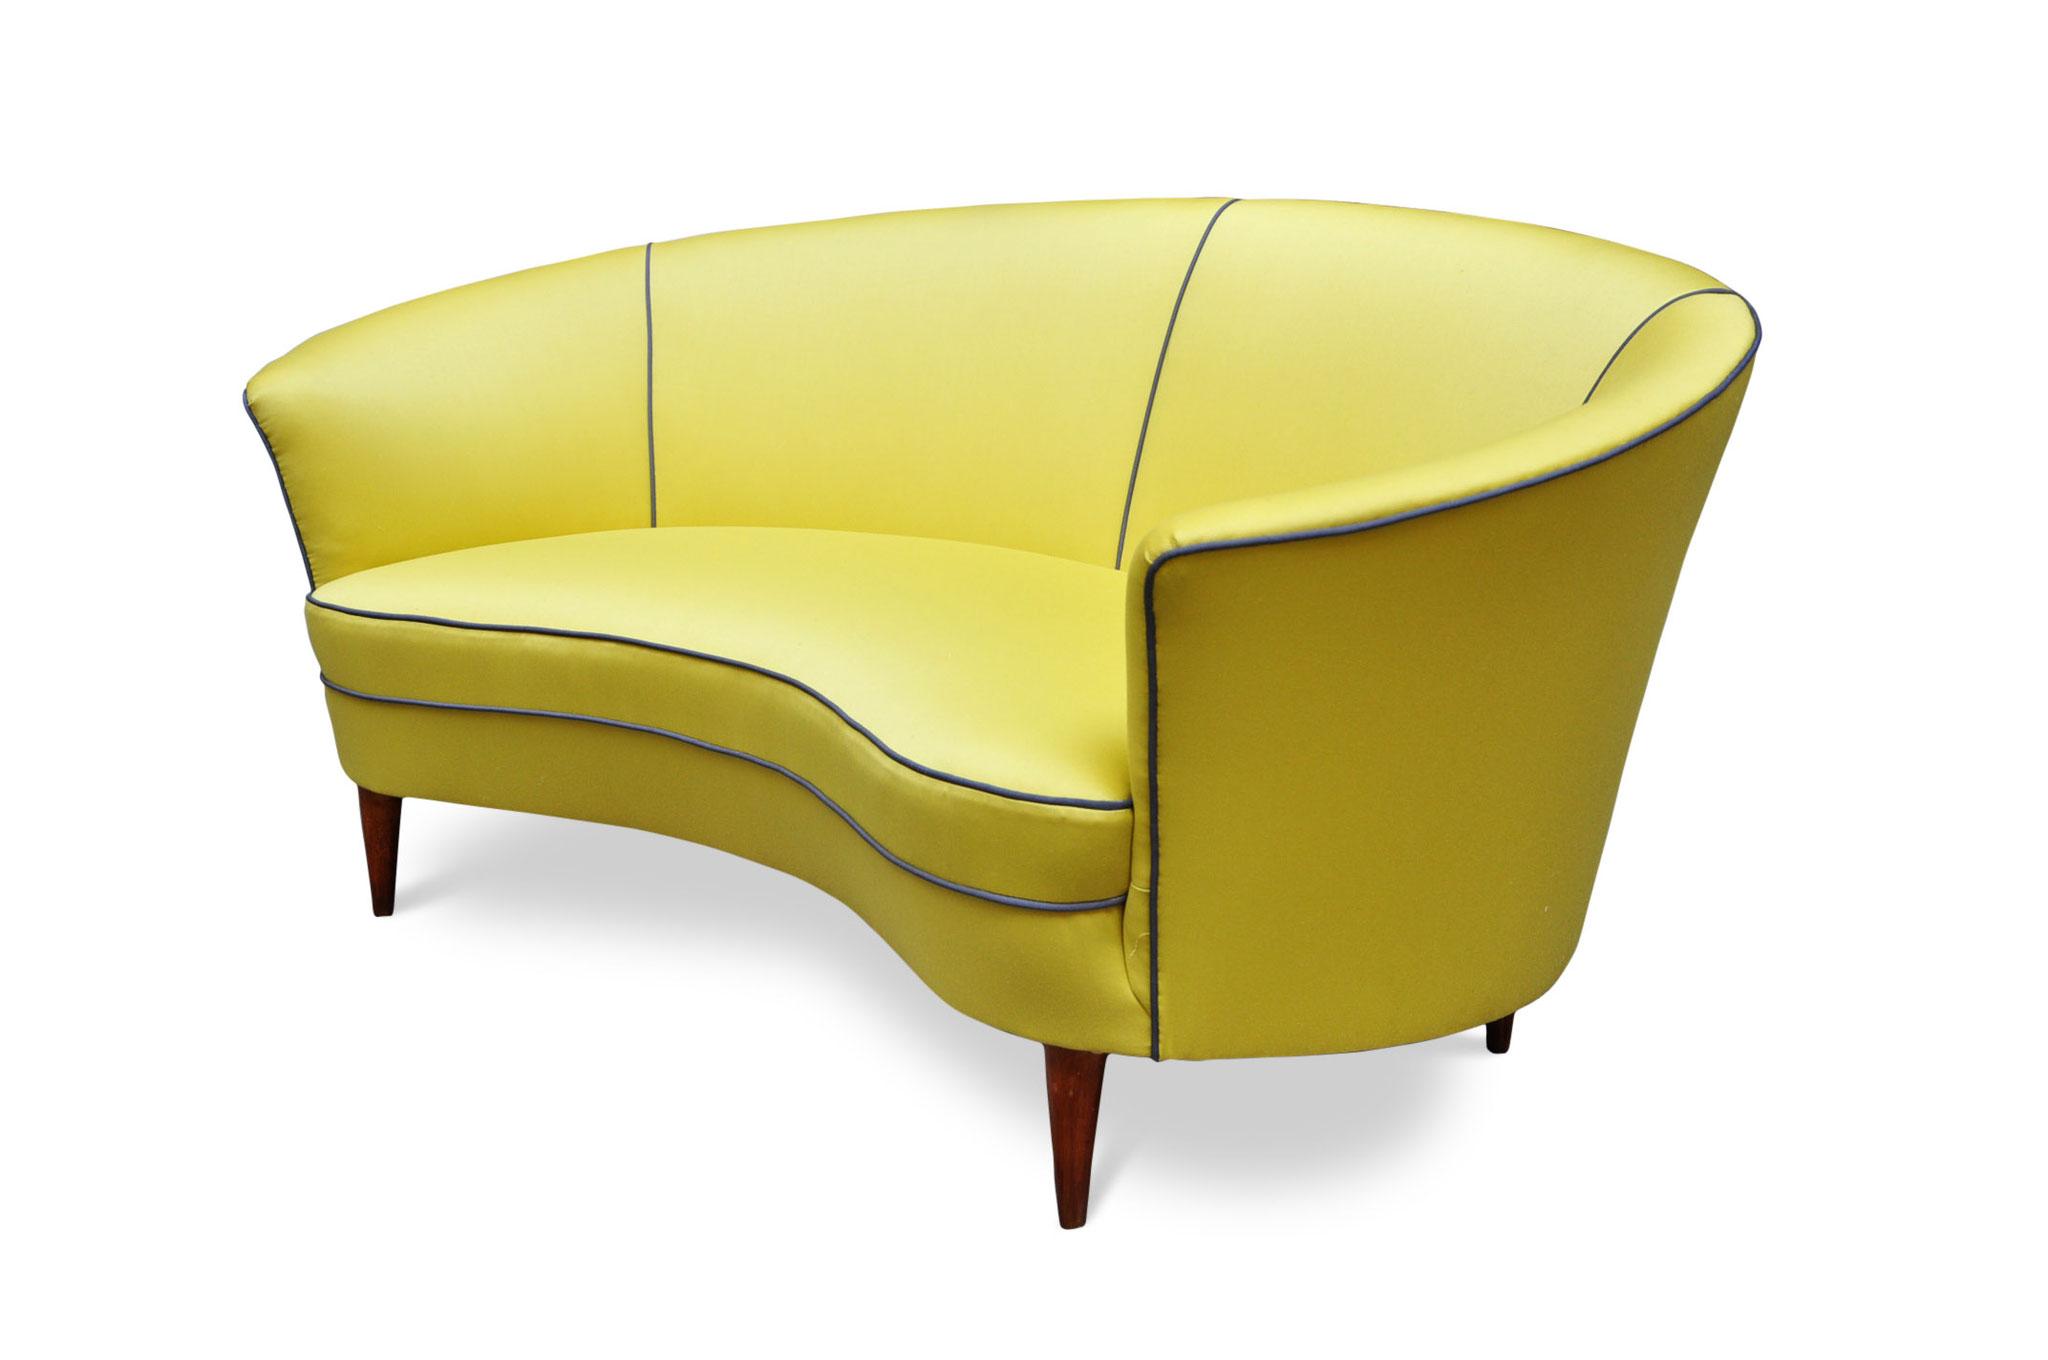 divanetto vintage anni 50 modernariato ico parisi